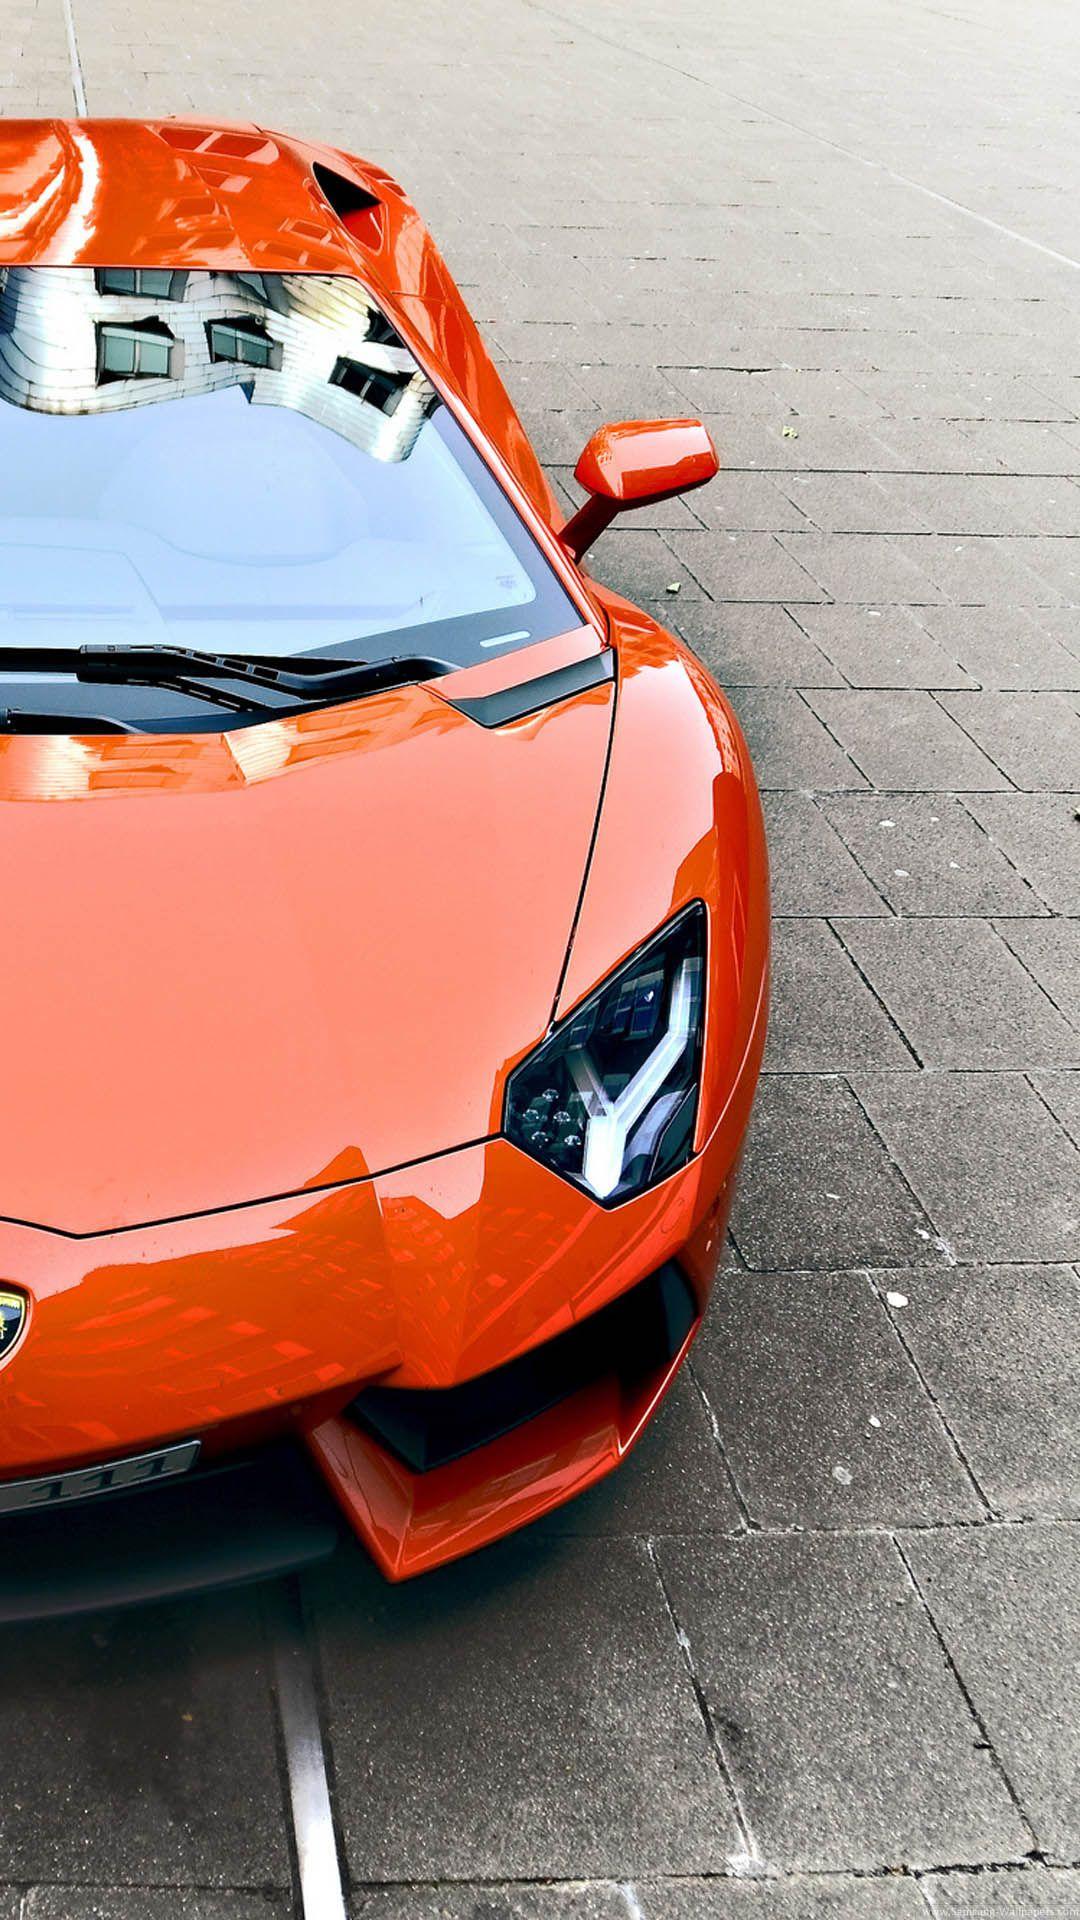 Iphone Lamborghini Wallpapers Hd Desktop Backgrounds X Car